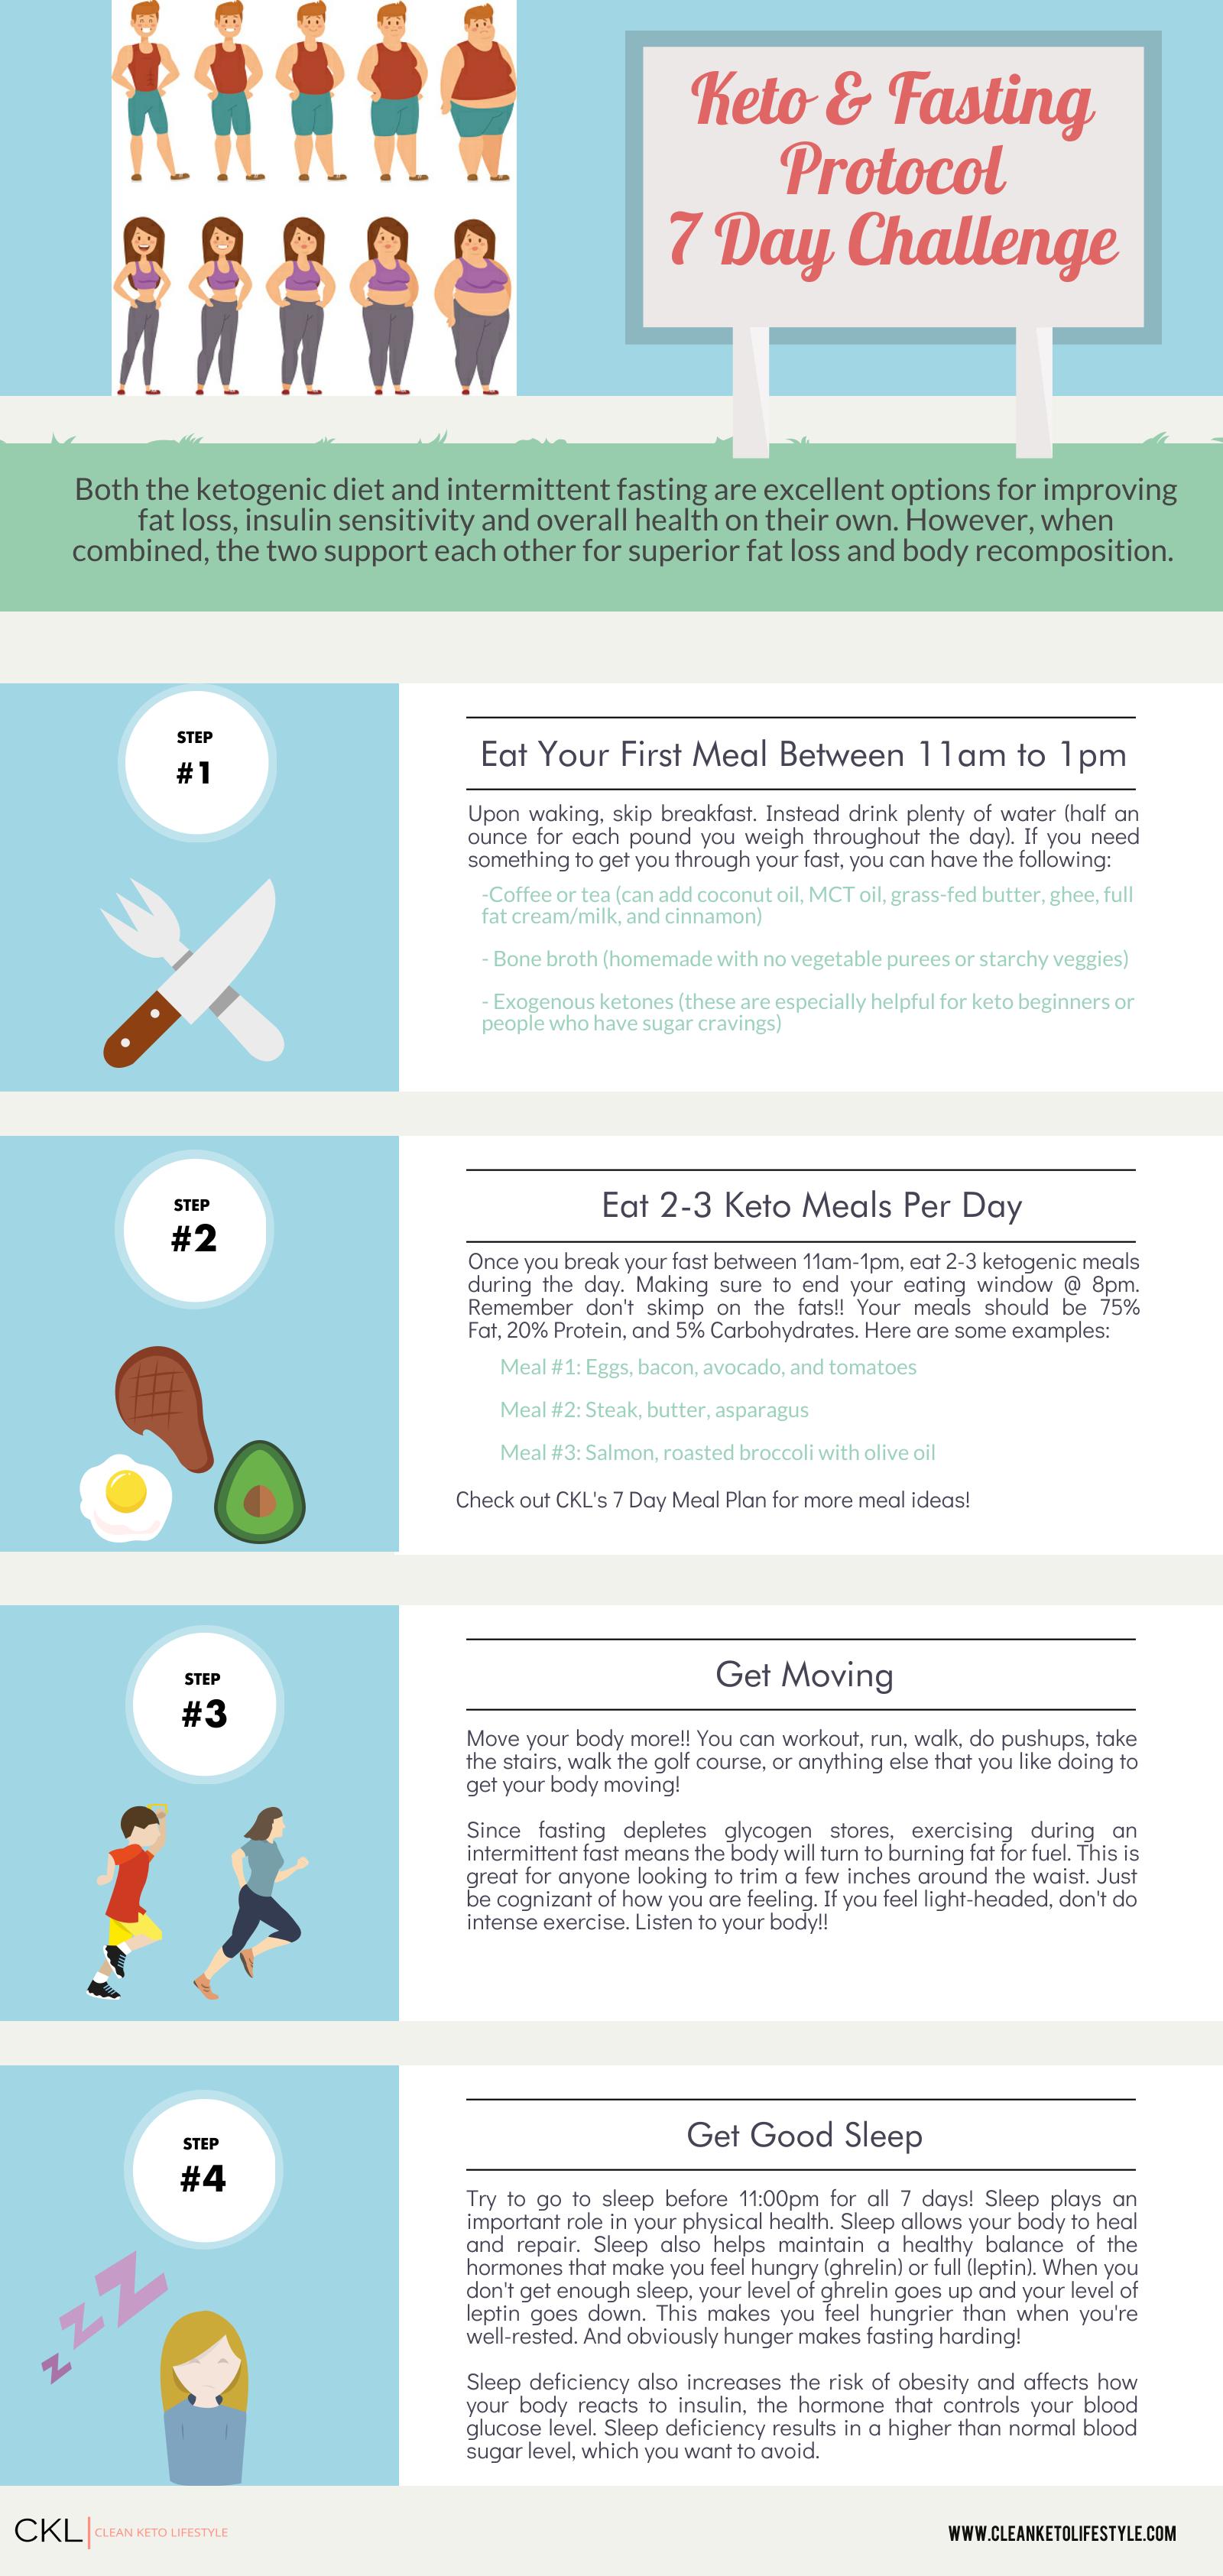 begginer intermittent fasting keto diet